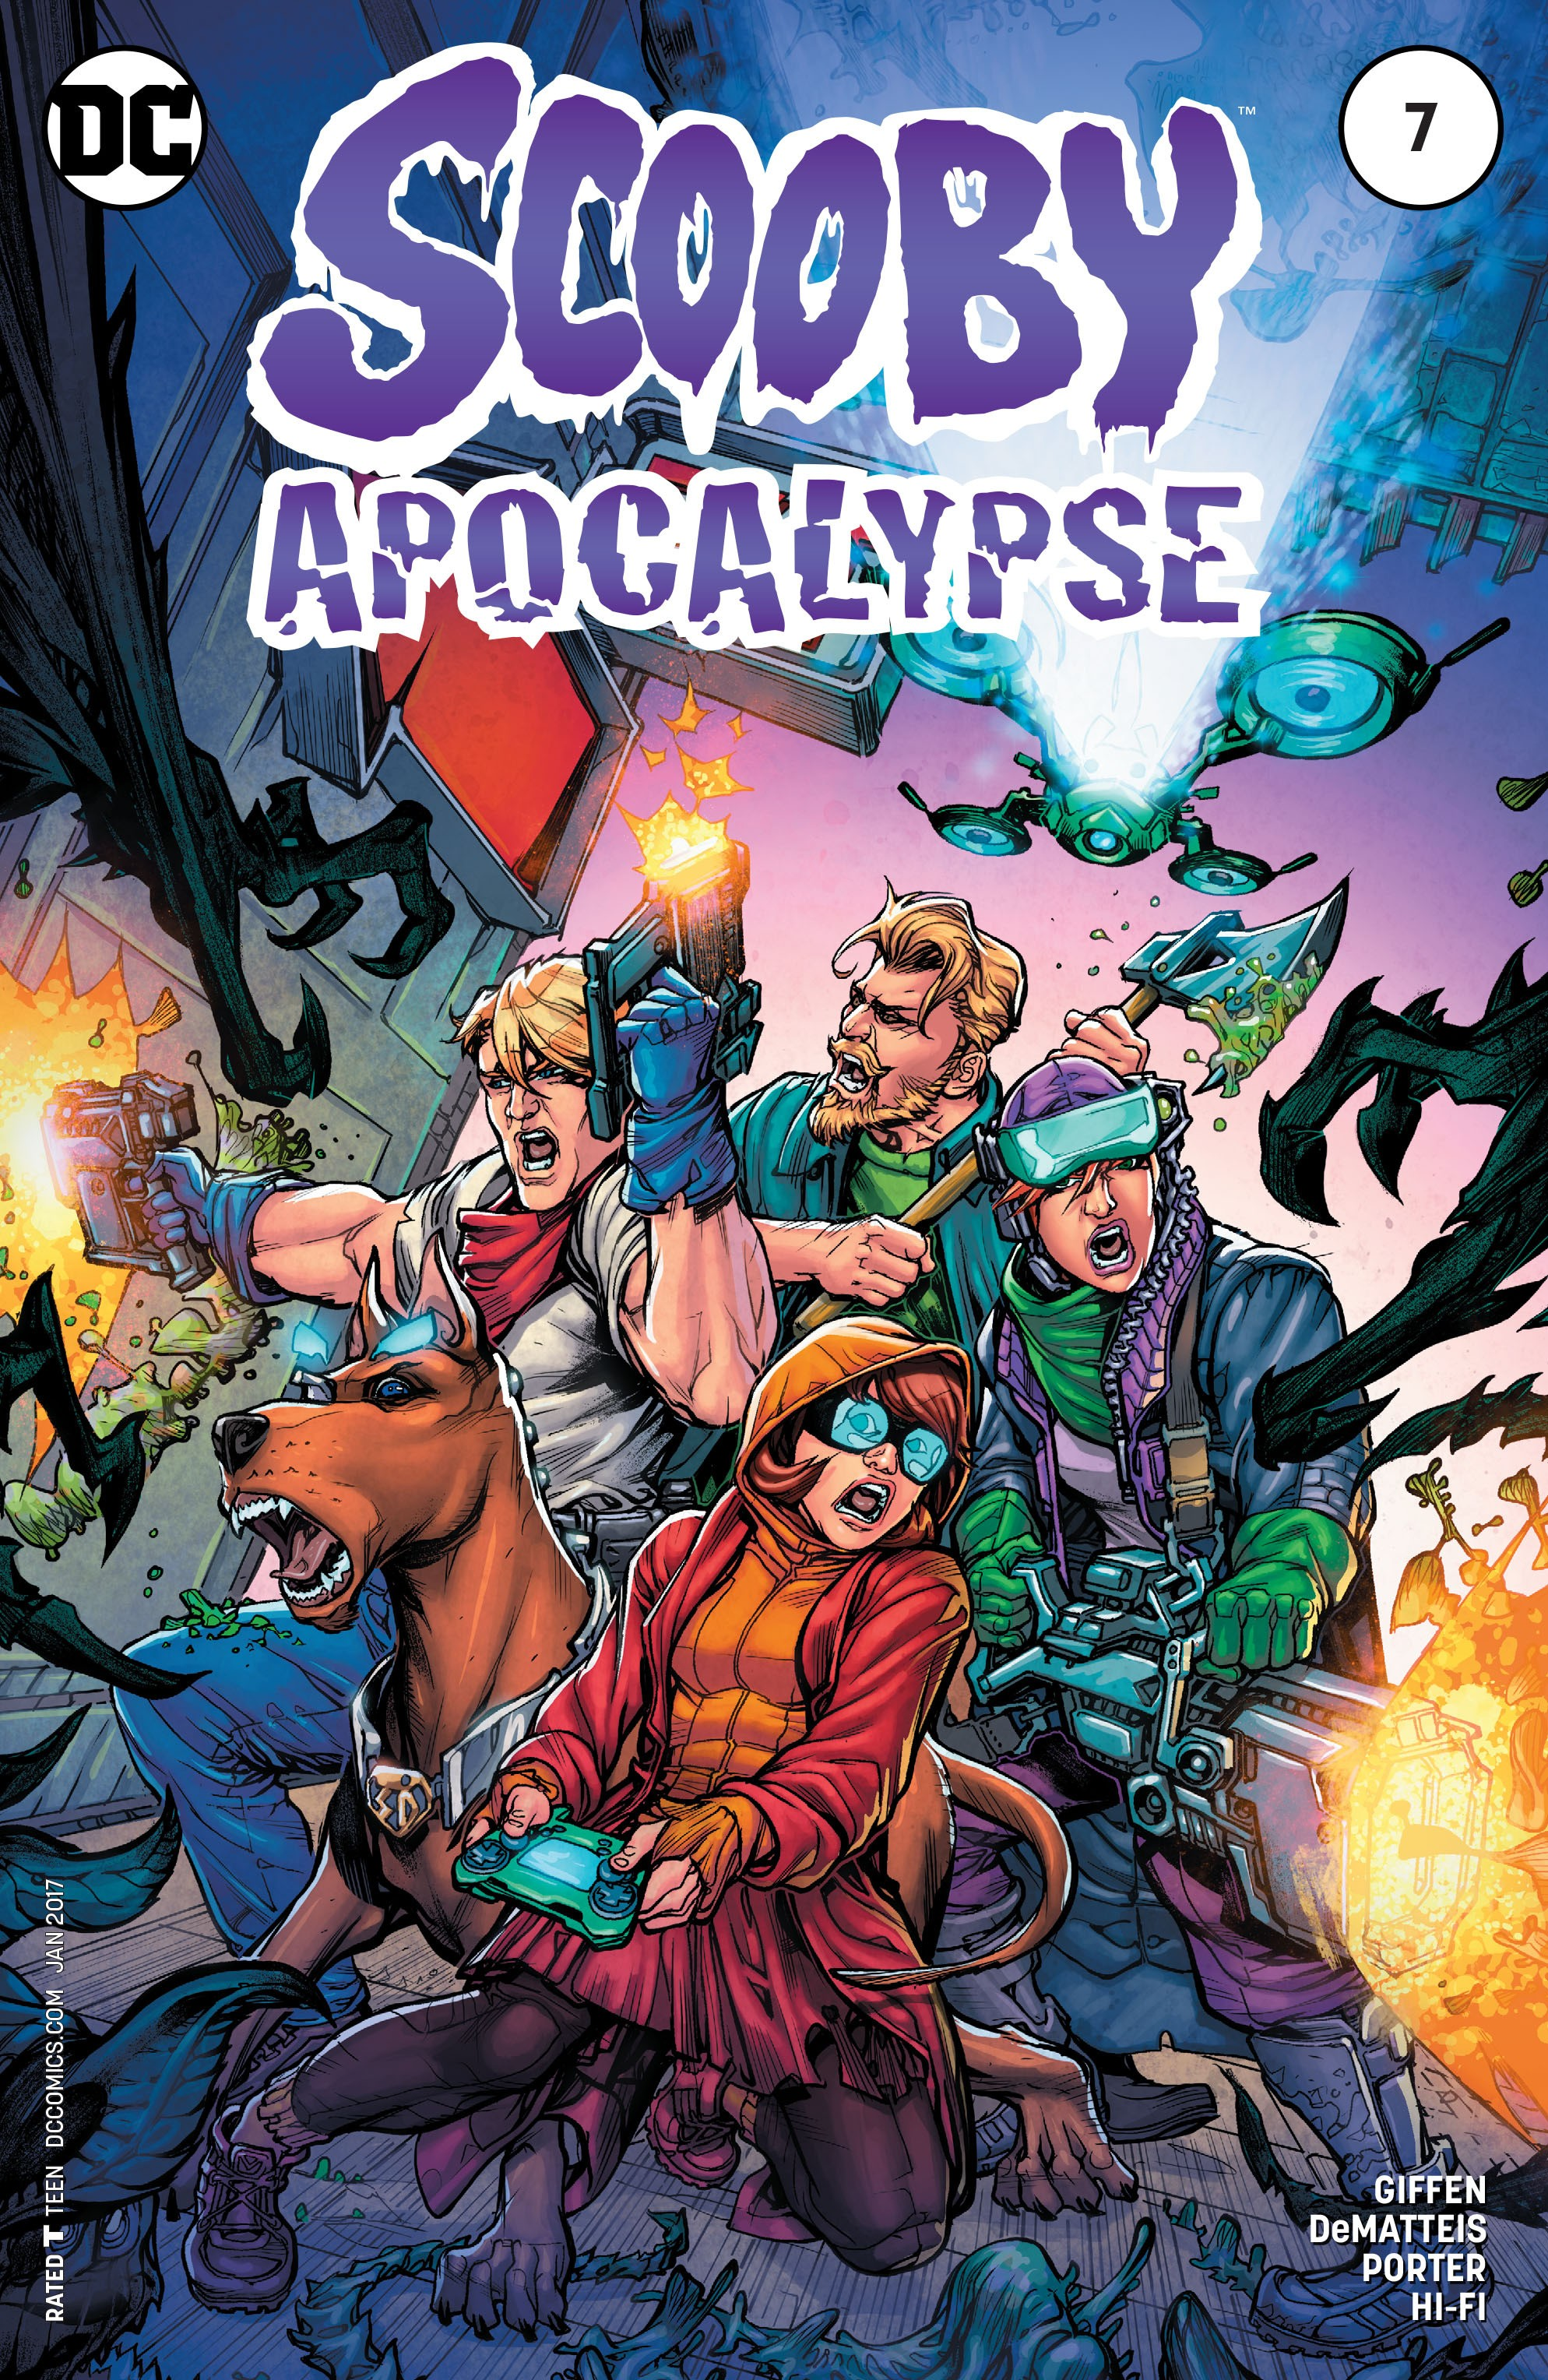 Read online Scooby Apocalypse comic -  Issue #7 - 1